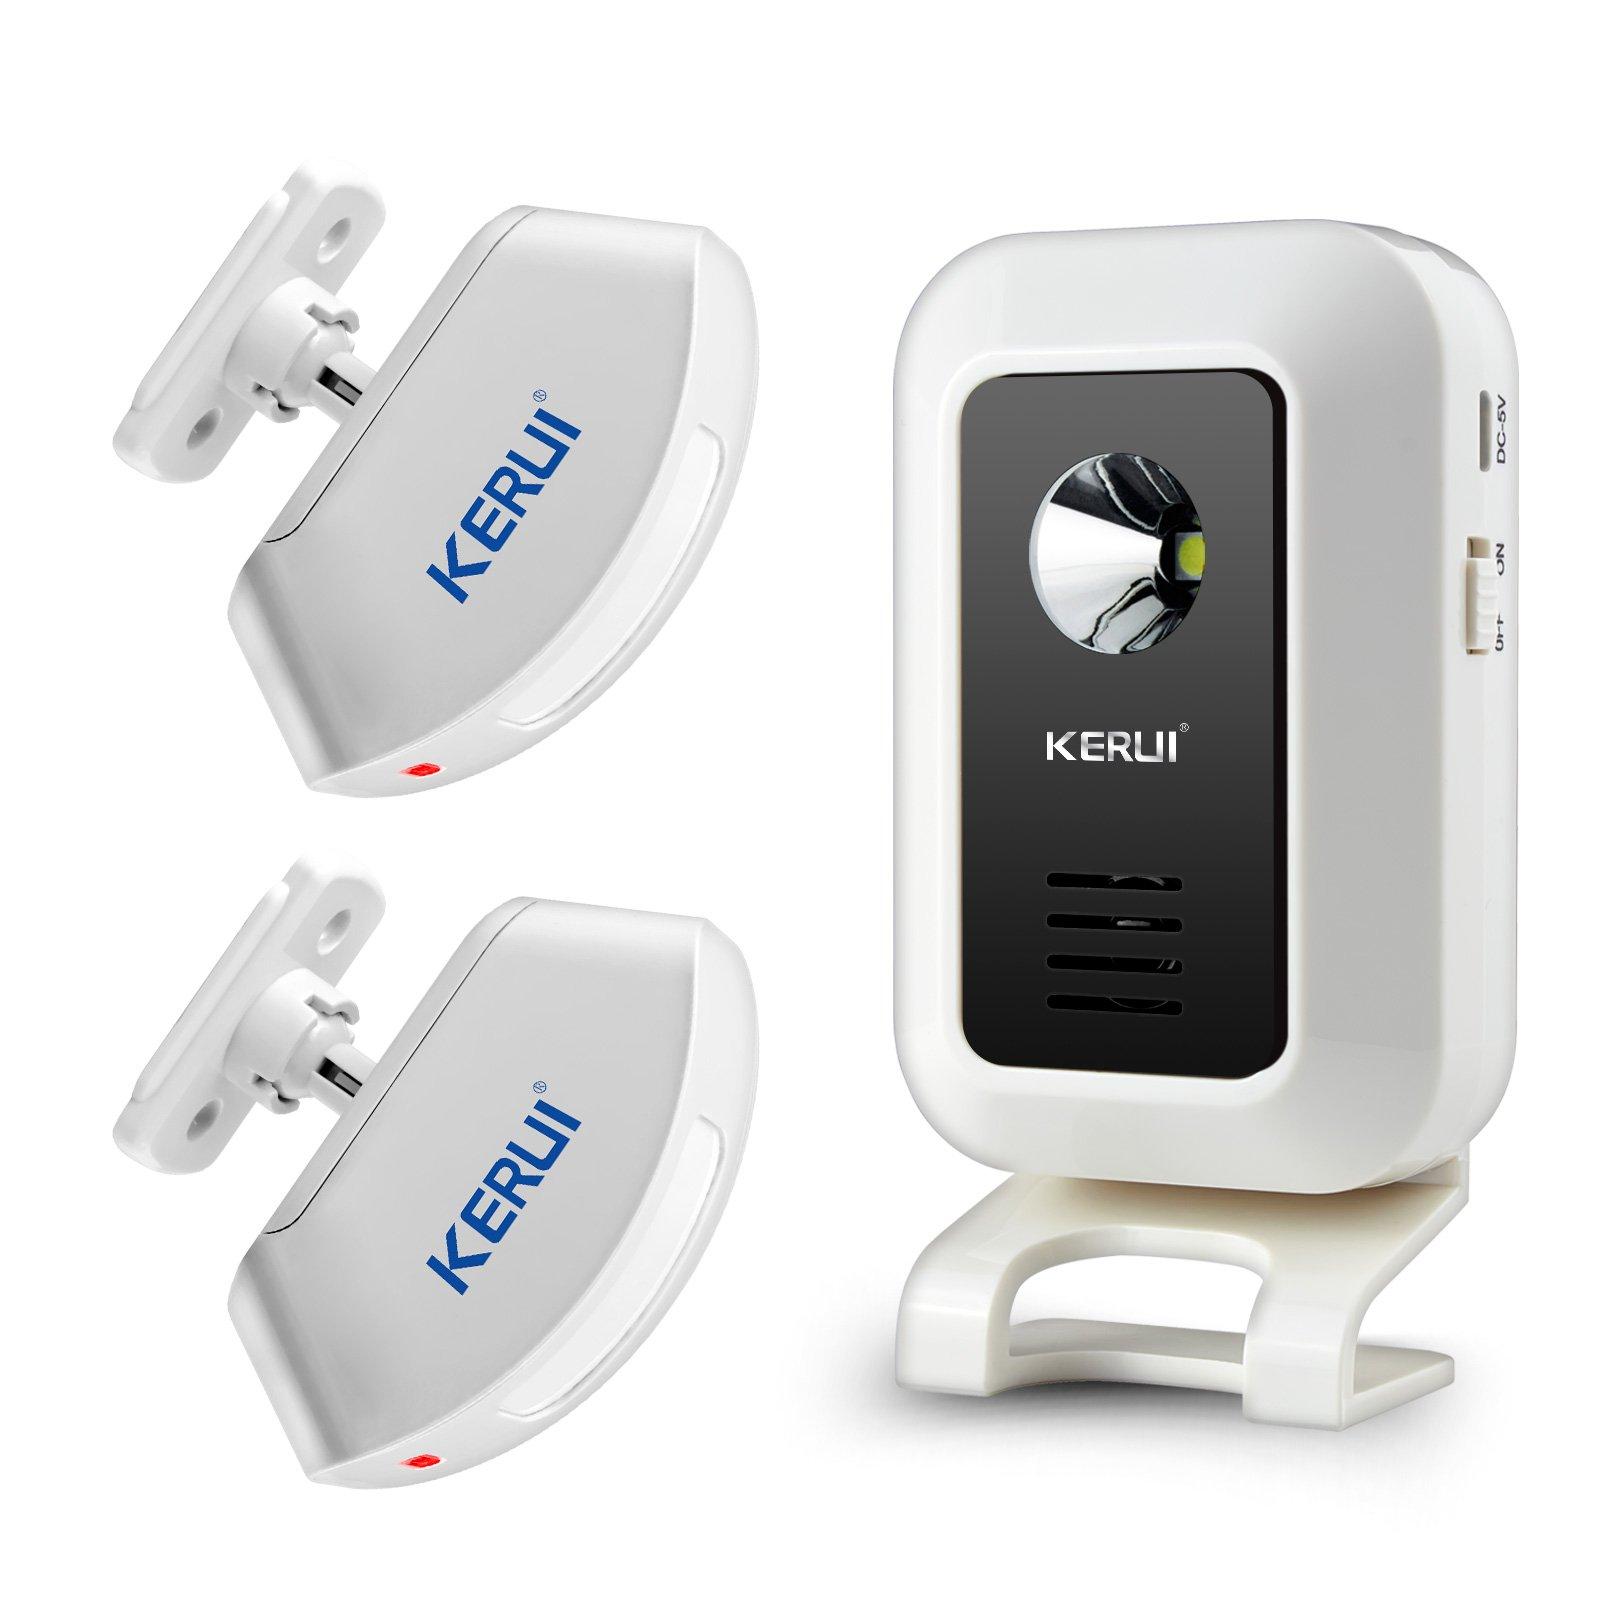 KERUI Wireless Welcome Door Bell Alarm Chime Kit-1 Receiver,2 Motion Sensor Detectors,Monitor Alert Detect Security Entry Doorbell Home Shop Store Visitor